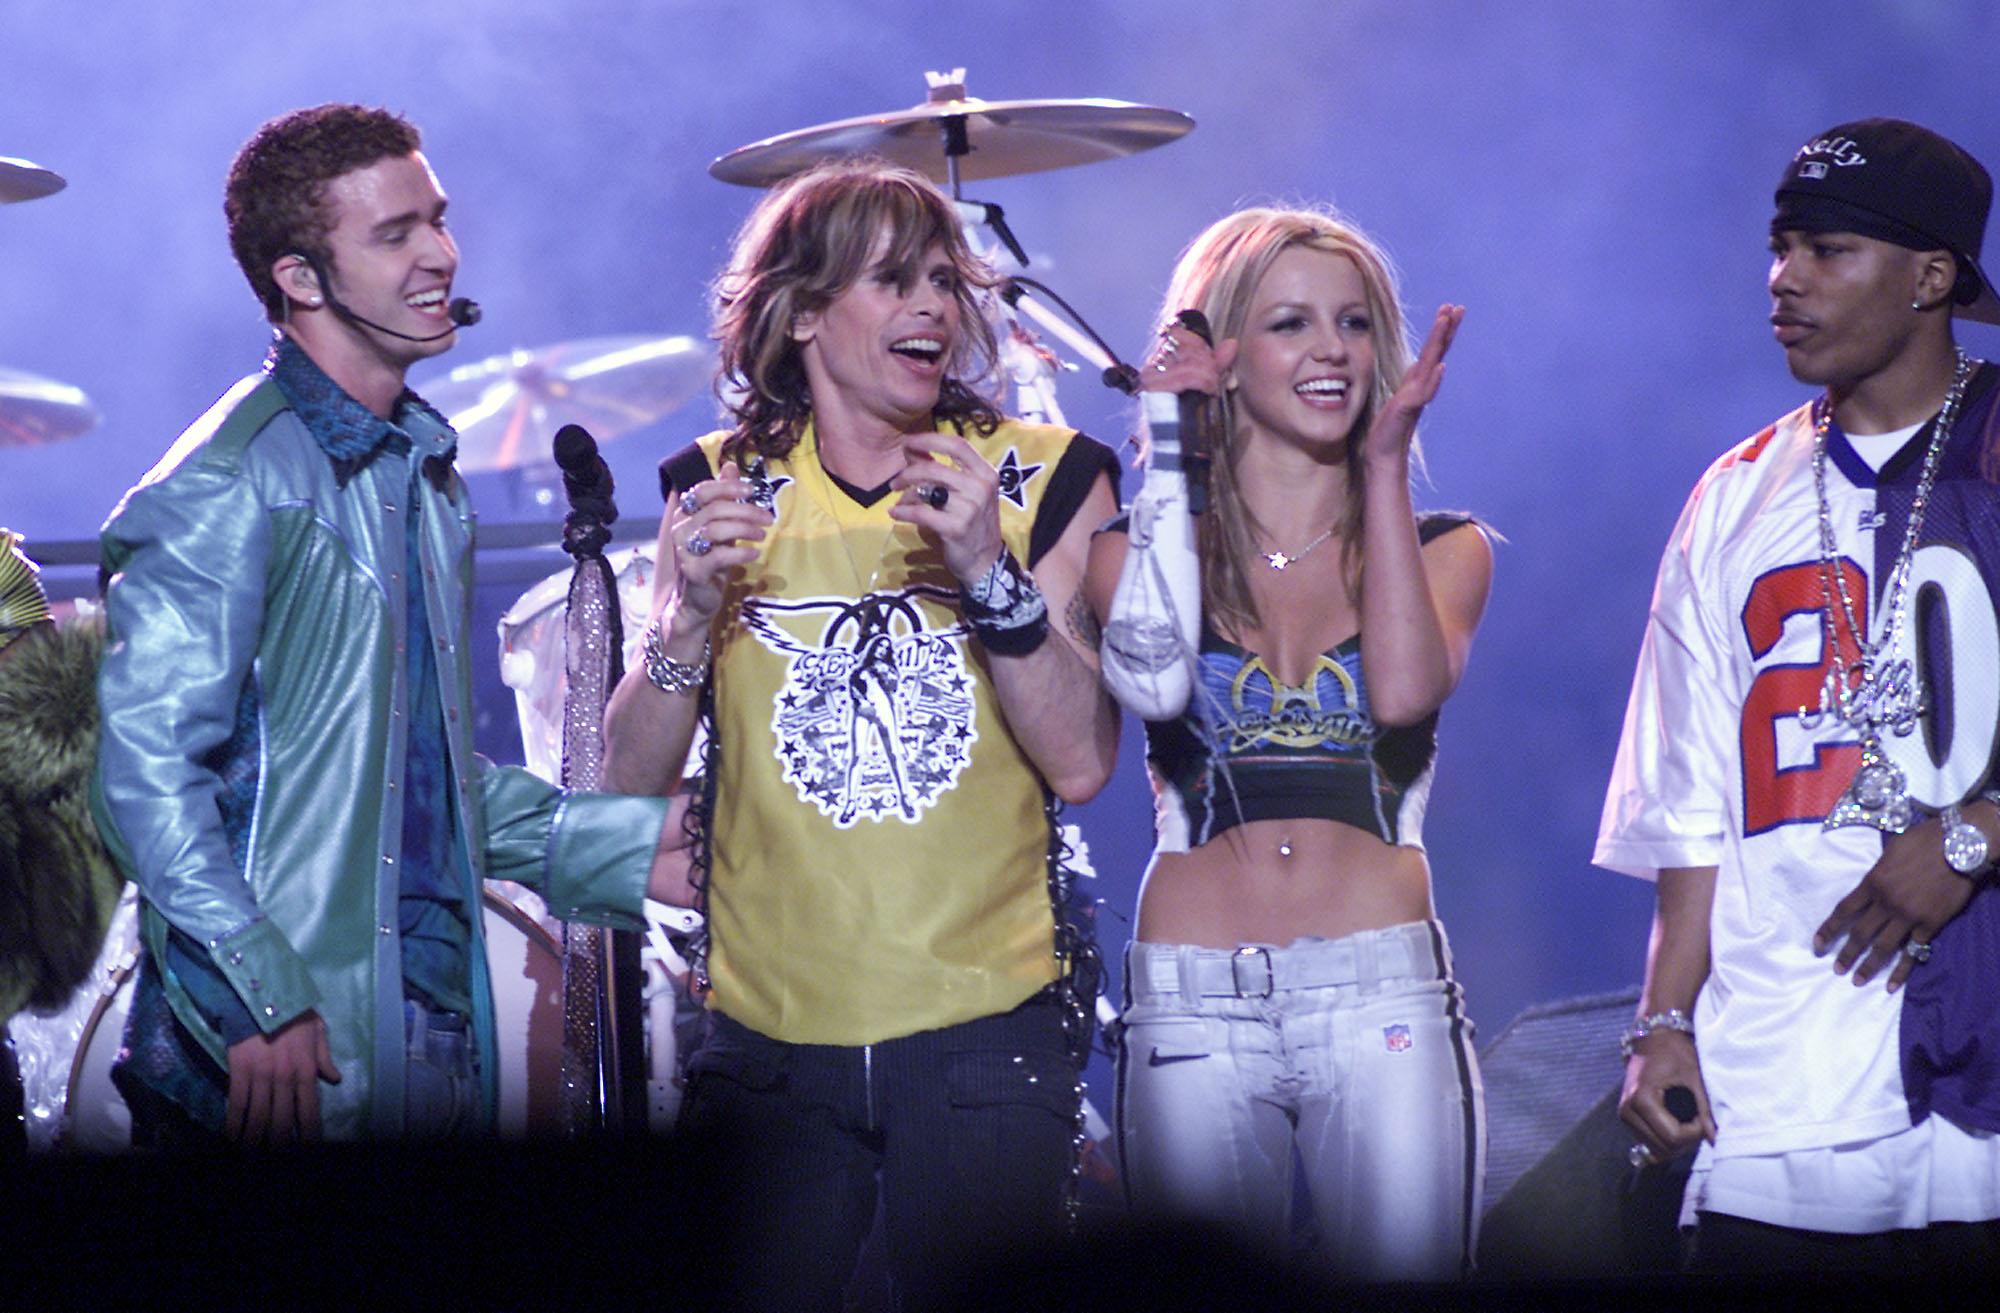 ustin Timberlake, Steven Tyler y Britney Spears durante el show del Super Bowl